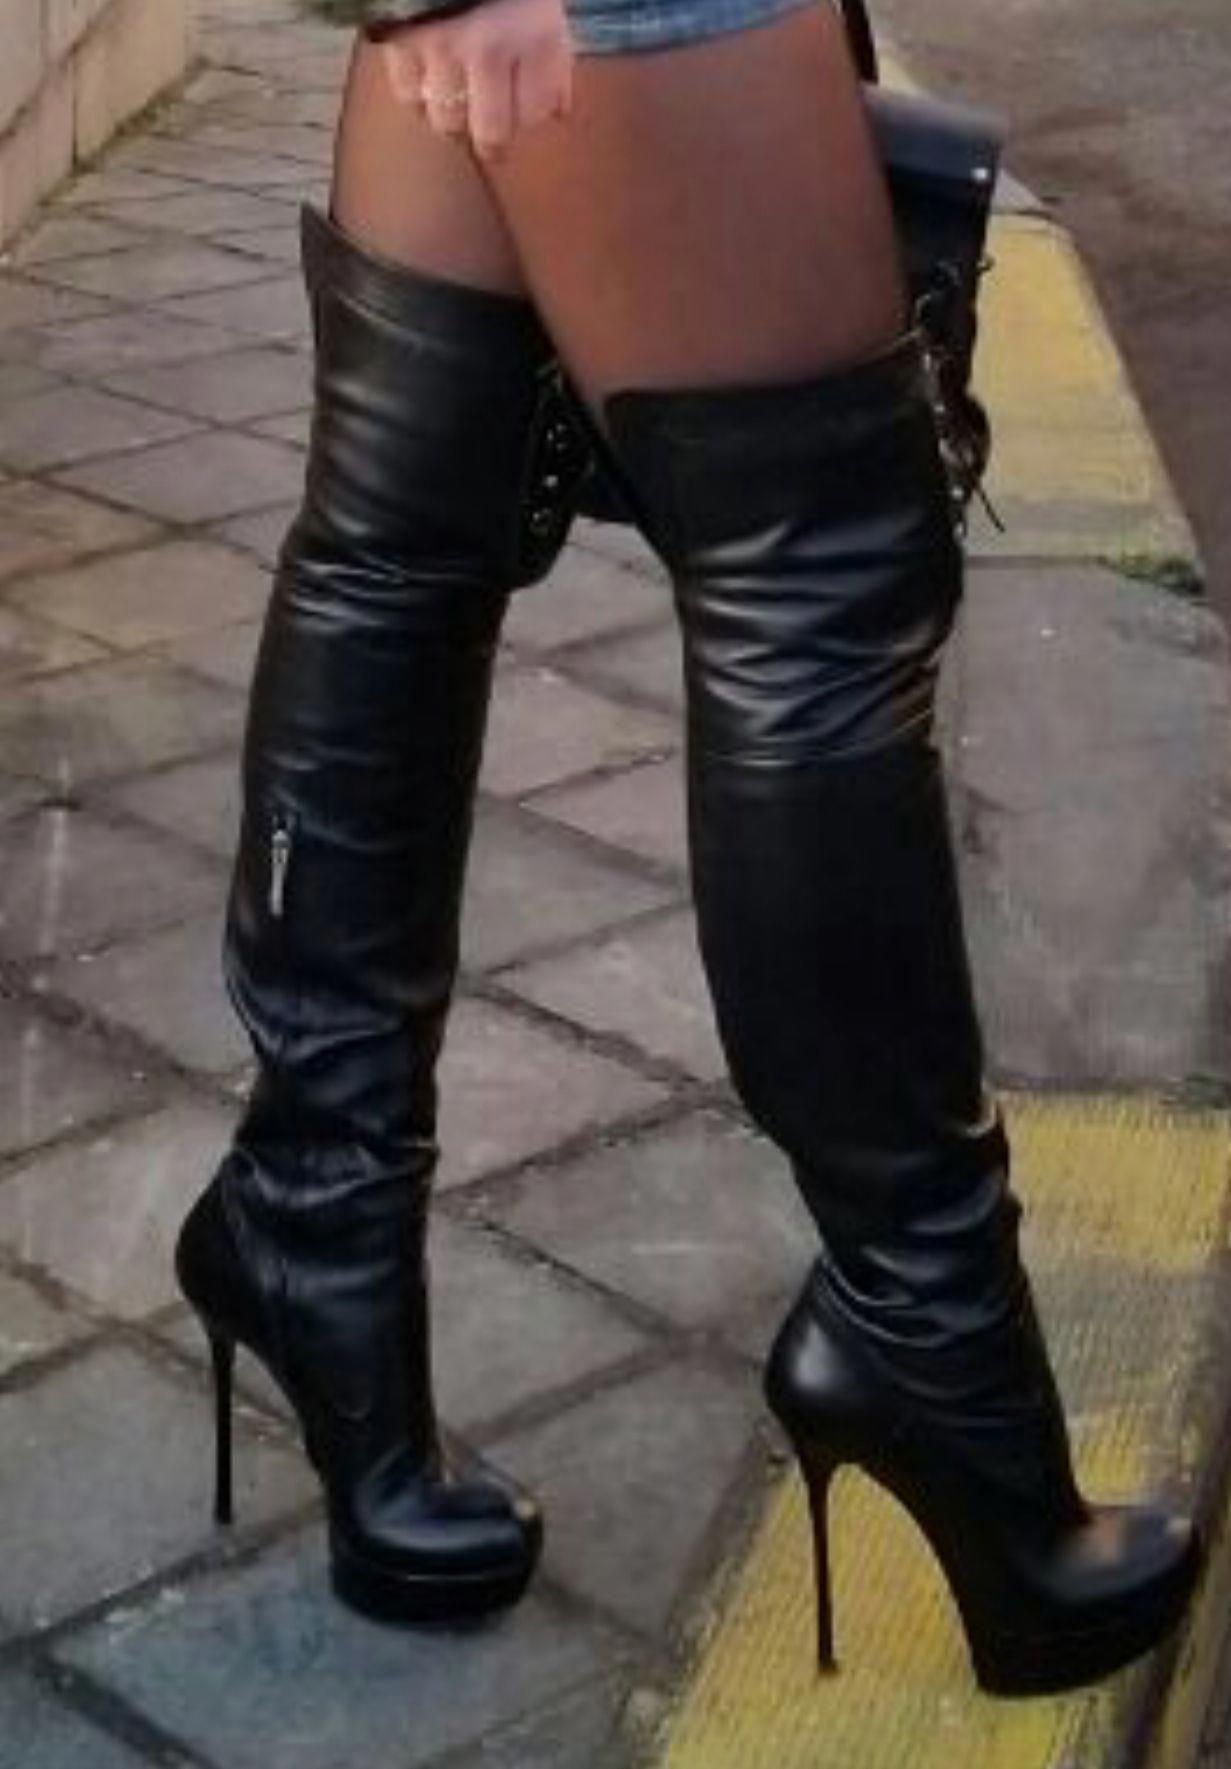 Pin on Platform high heels